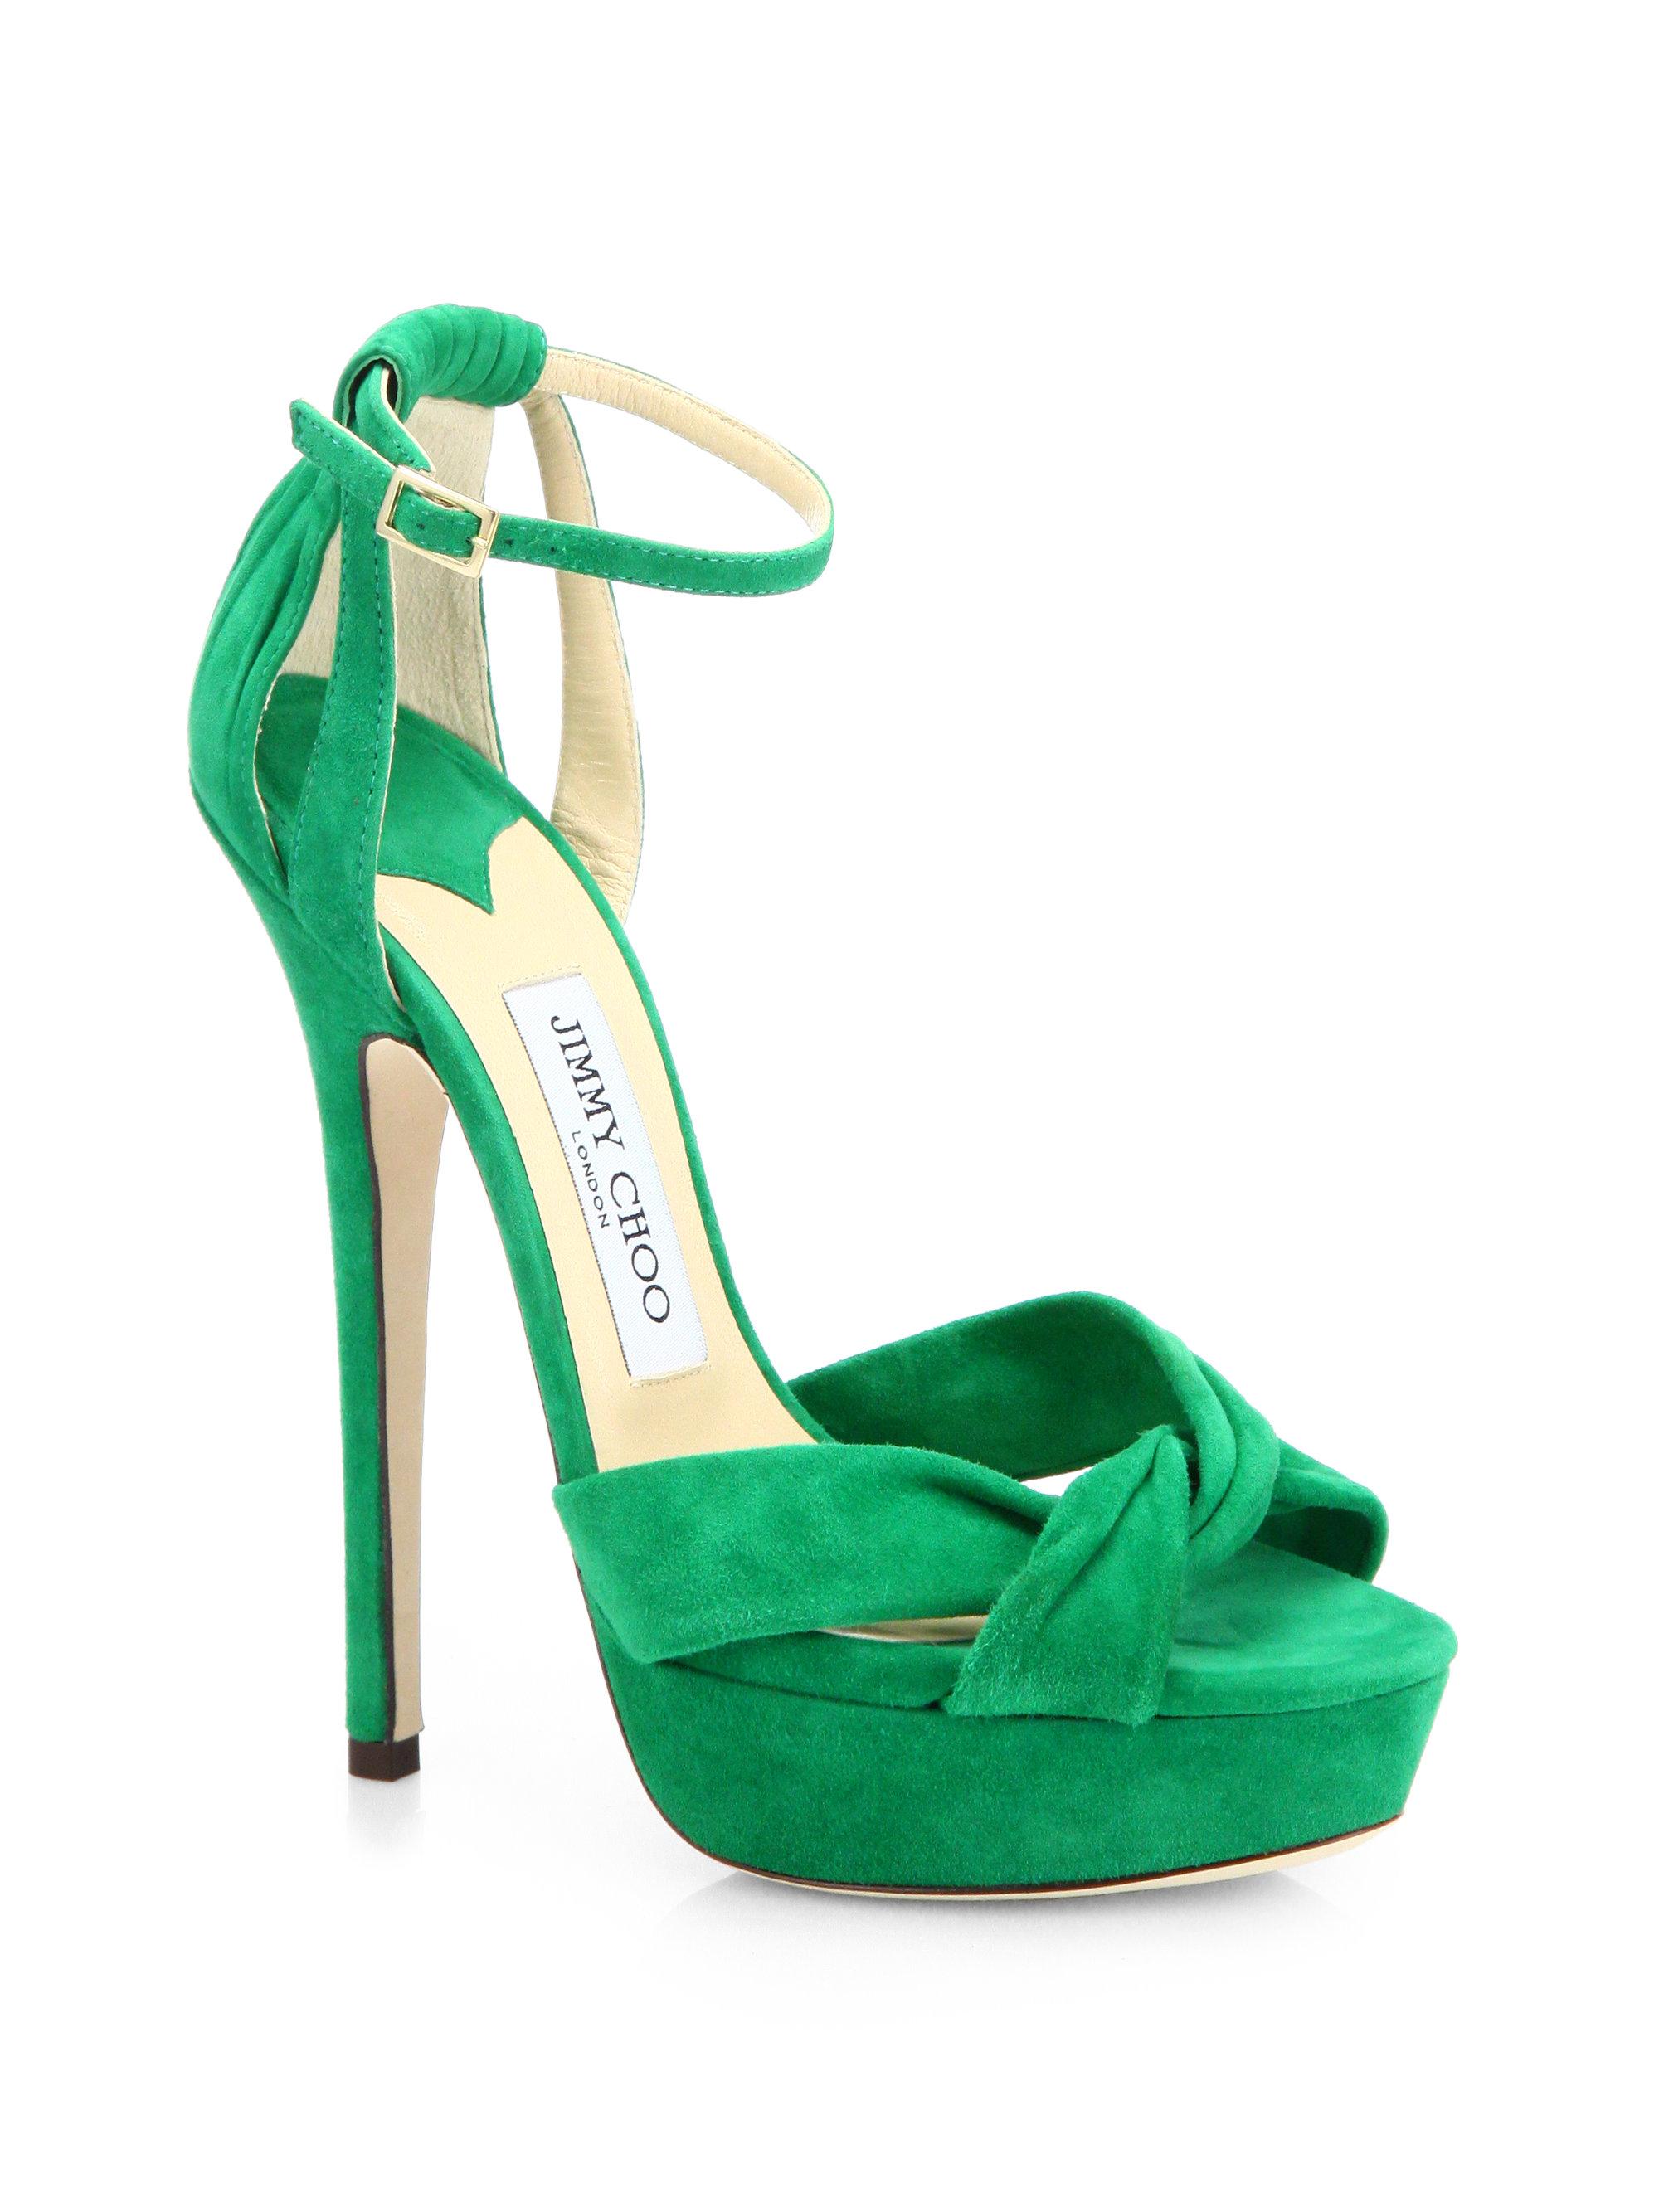 1905f595388 Lyst - Jimmy Choo Greta Suede Ankle Strap Platform Sandals in Green